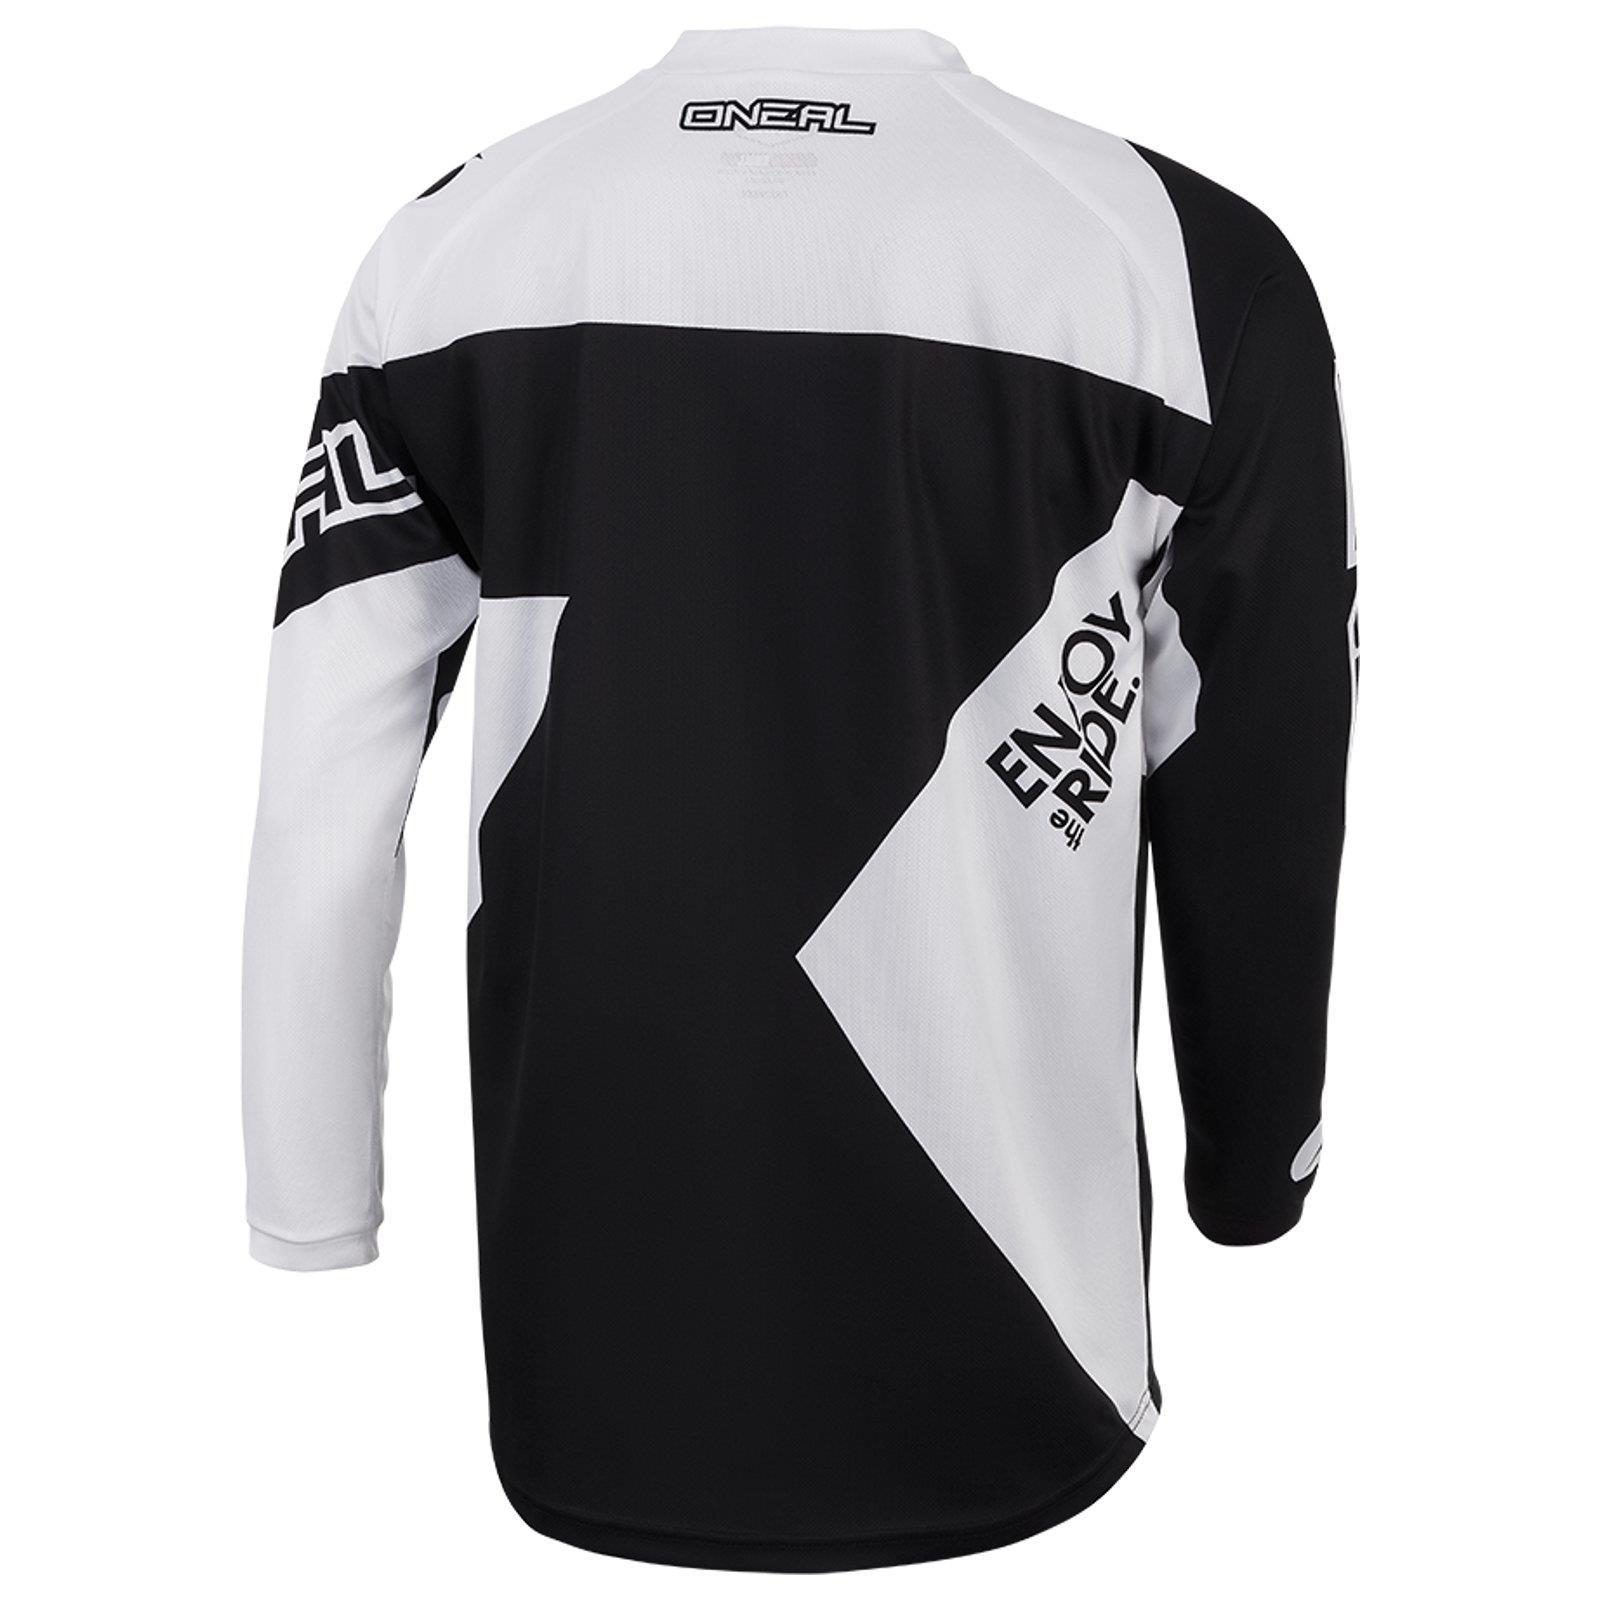 O-039-Neal-elemento-Mayhem-JERSEY-Racewear-Motocross-Maglia-MX-DH-FR-MTB-MOUNTAIN-BIKE miniatura 62